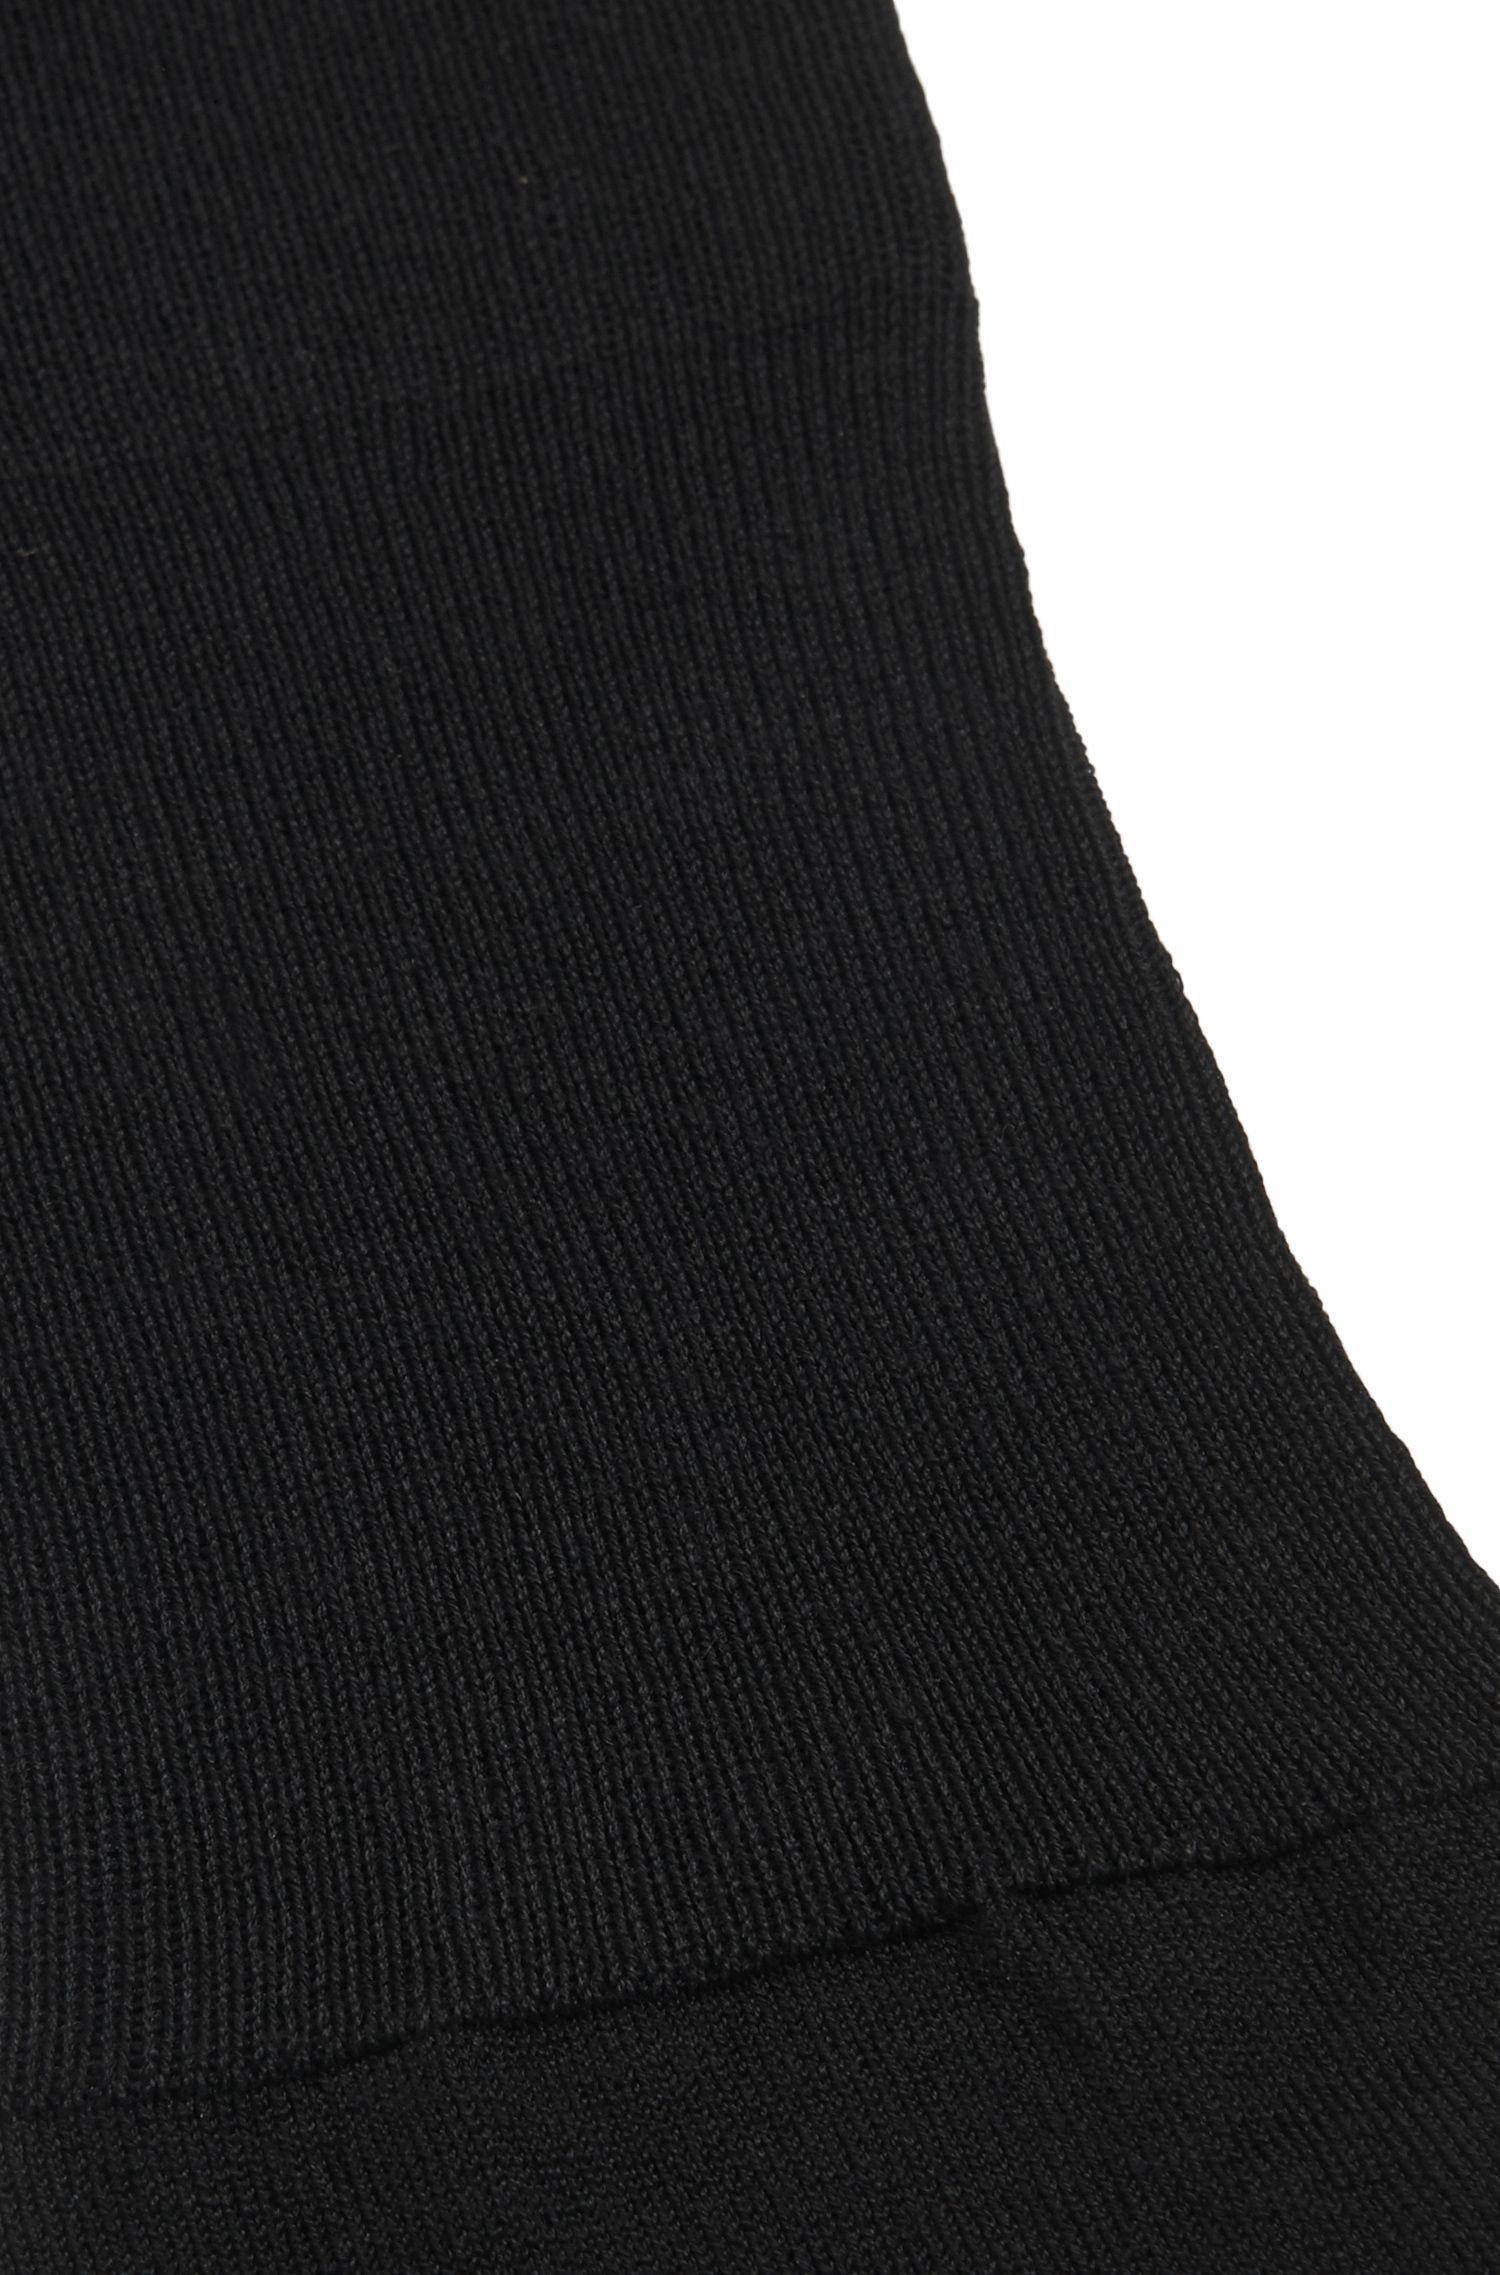 Unifarbene Kniestrümpfe aus merzerisiertem Baumwoll-Mix: 'KH Colours'